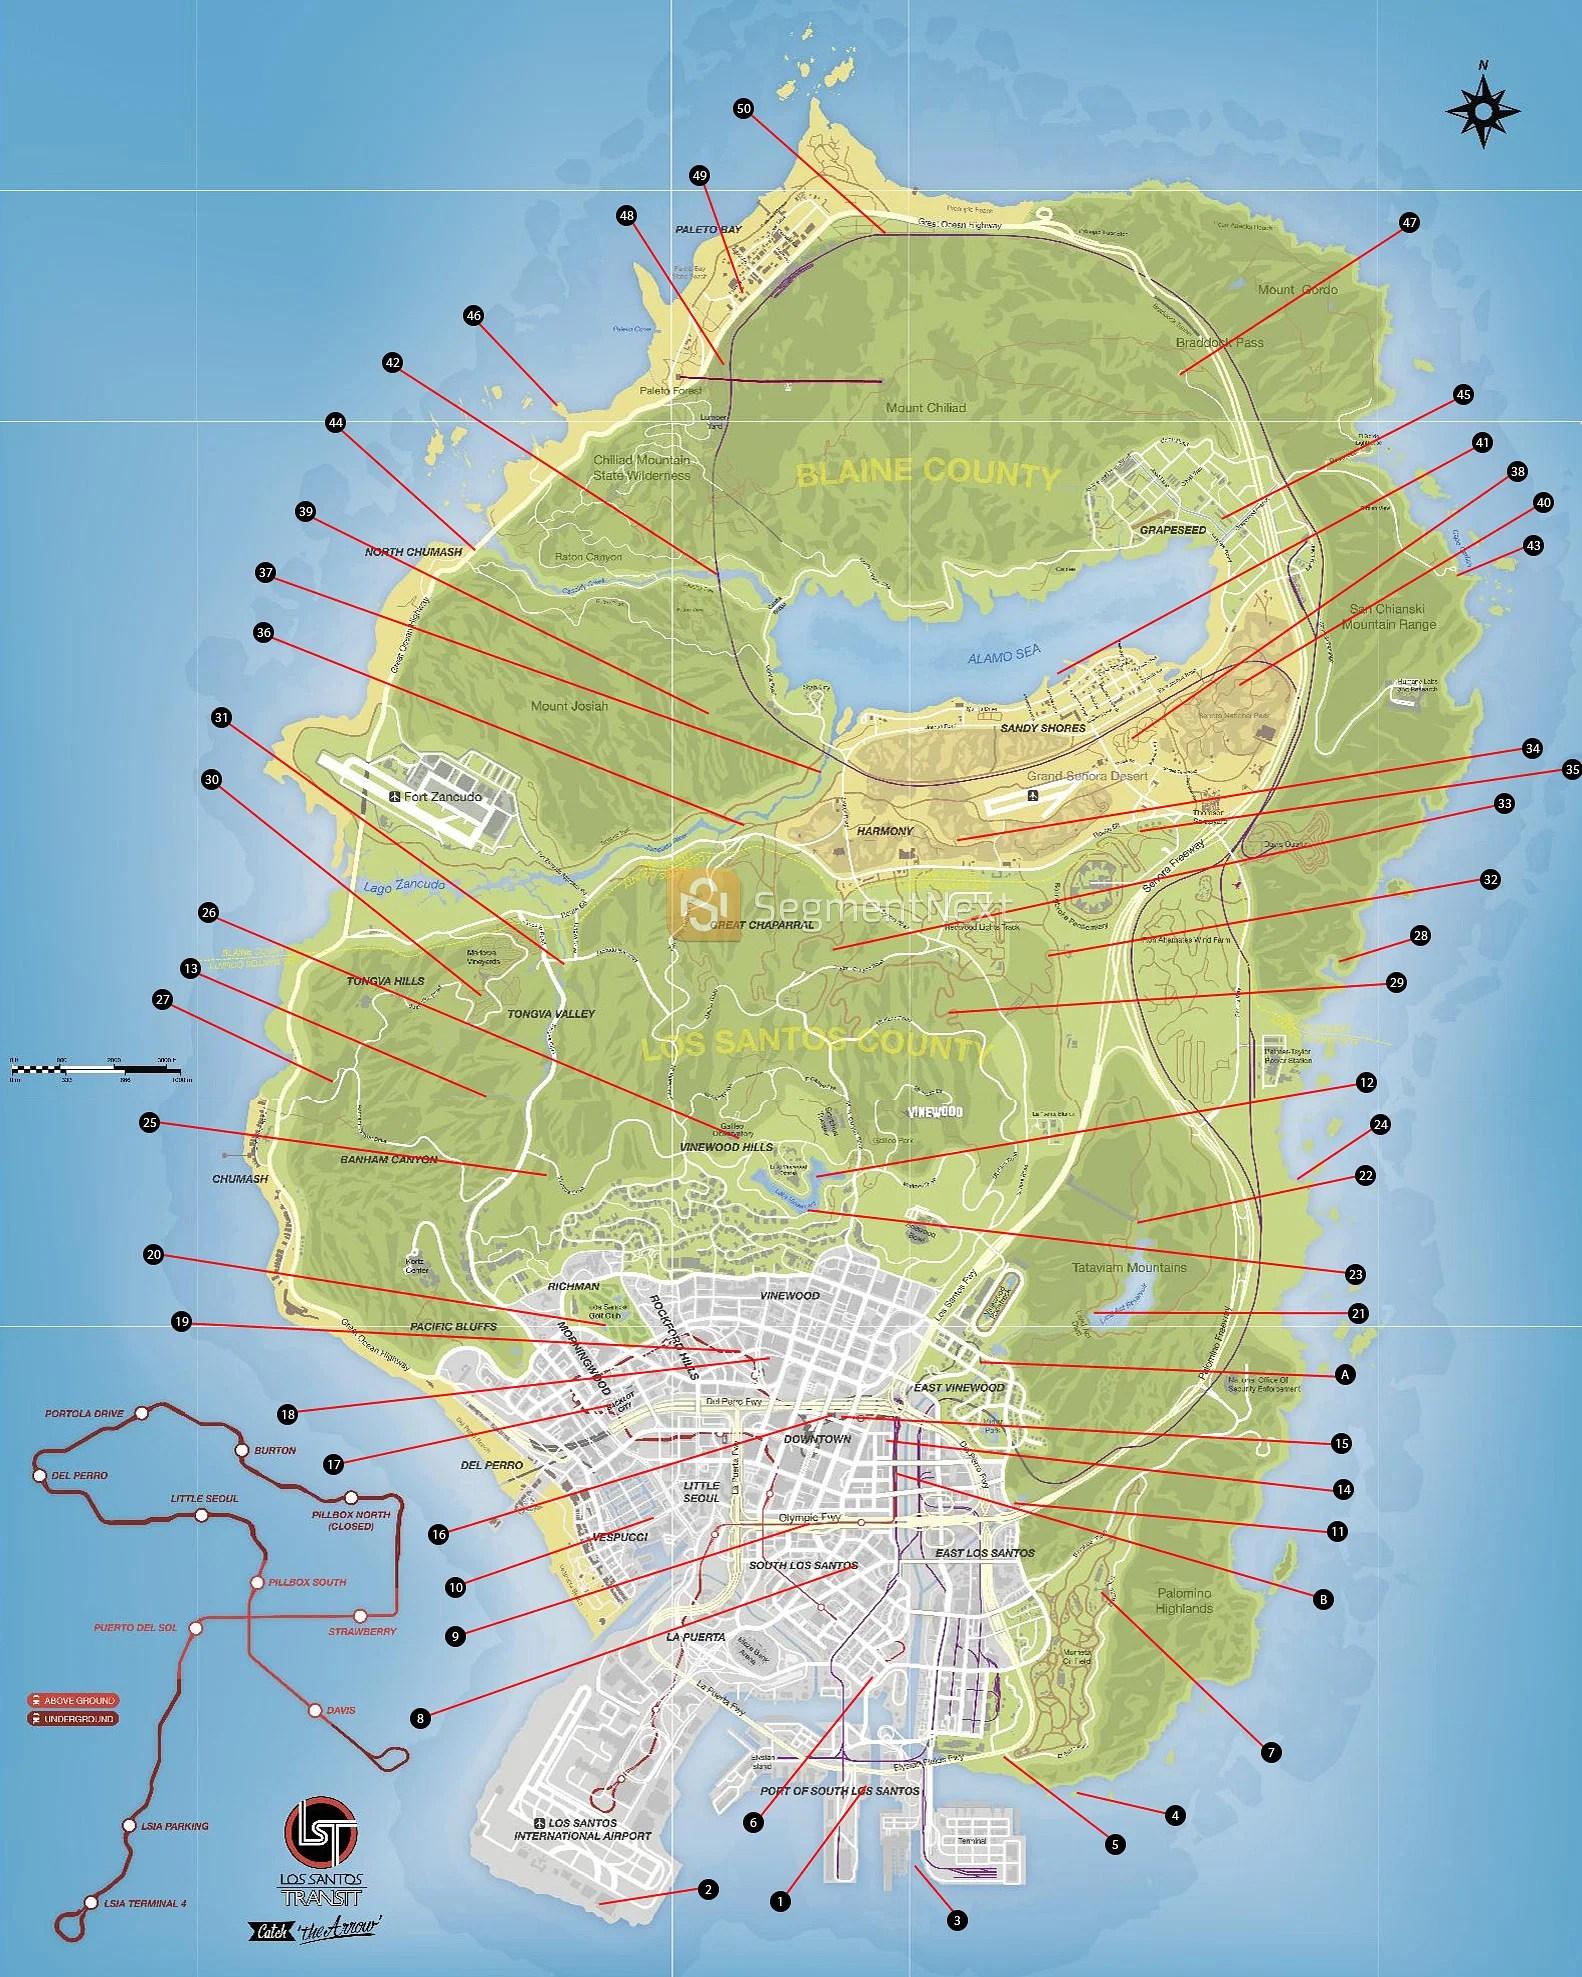 Gta 5 Rare Car Locations Map Offline : locations, offline, Hidden, Vehicles